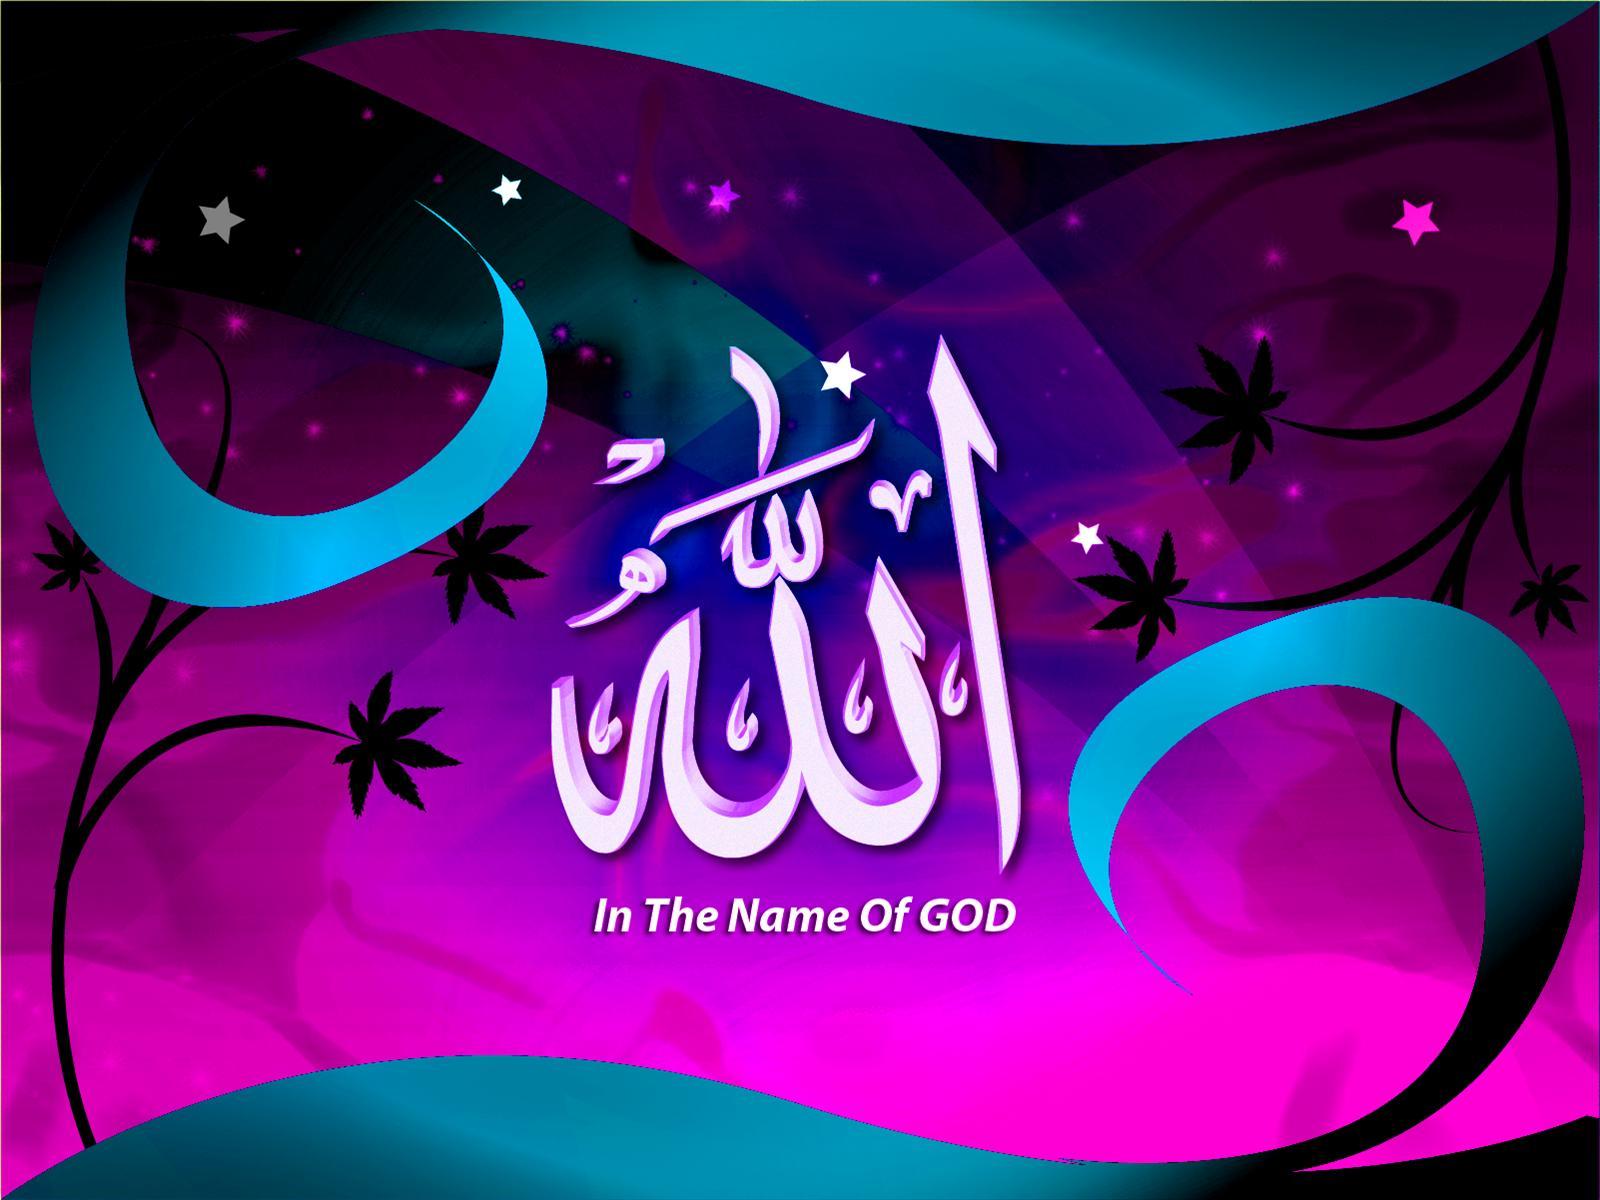 islamic allah wallpaper name of allah wallpaper HD Free downloadjpg 1600x1200